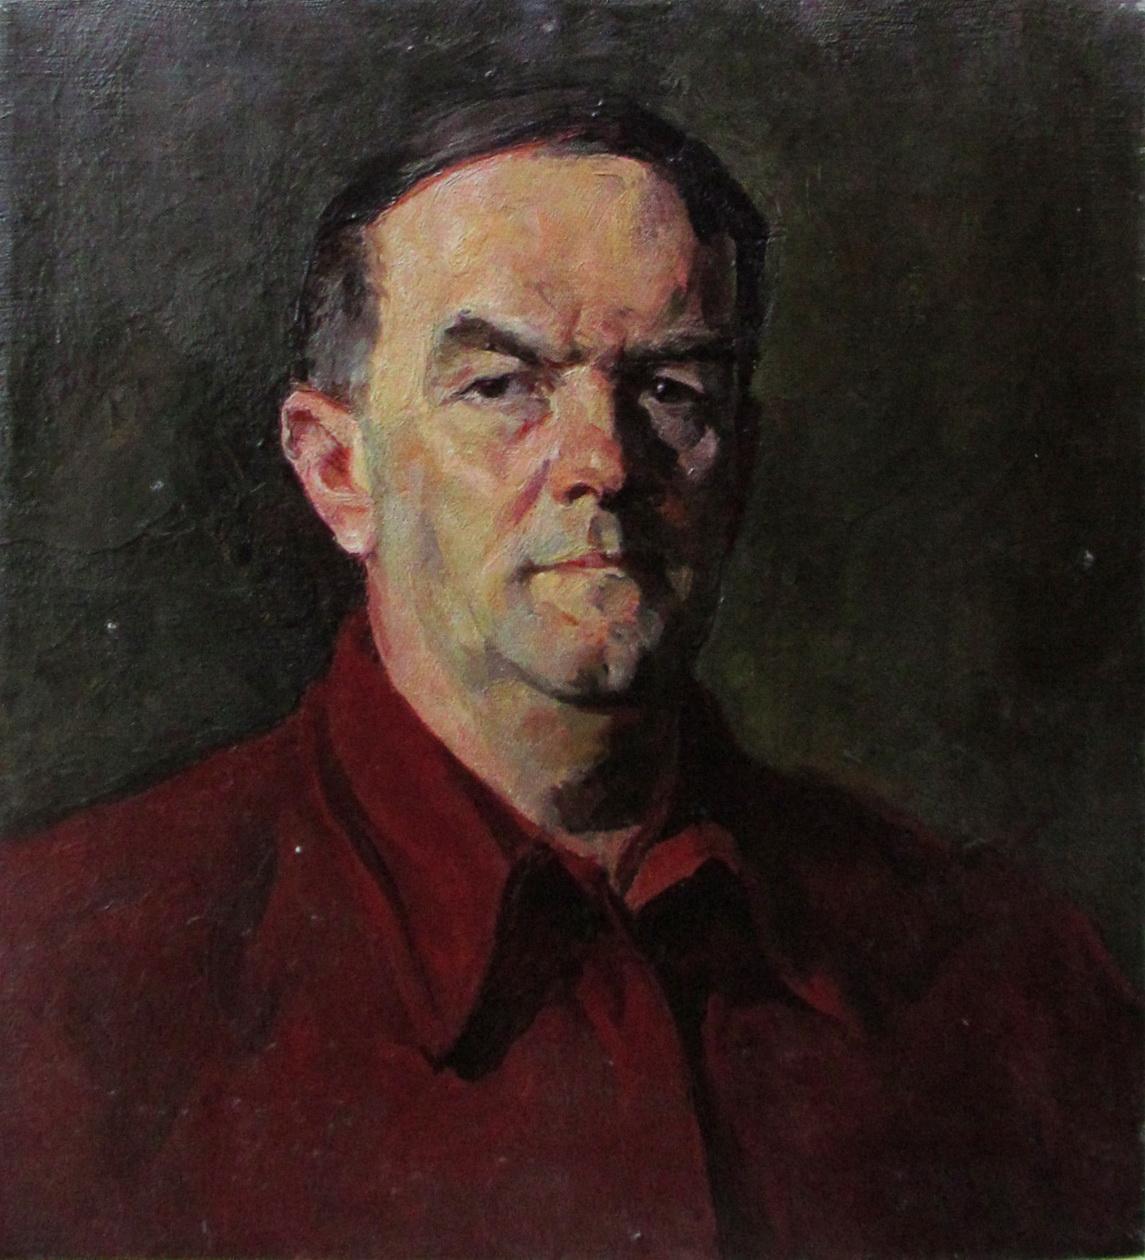 Автопортрет художника Филатов Константин